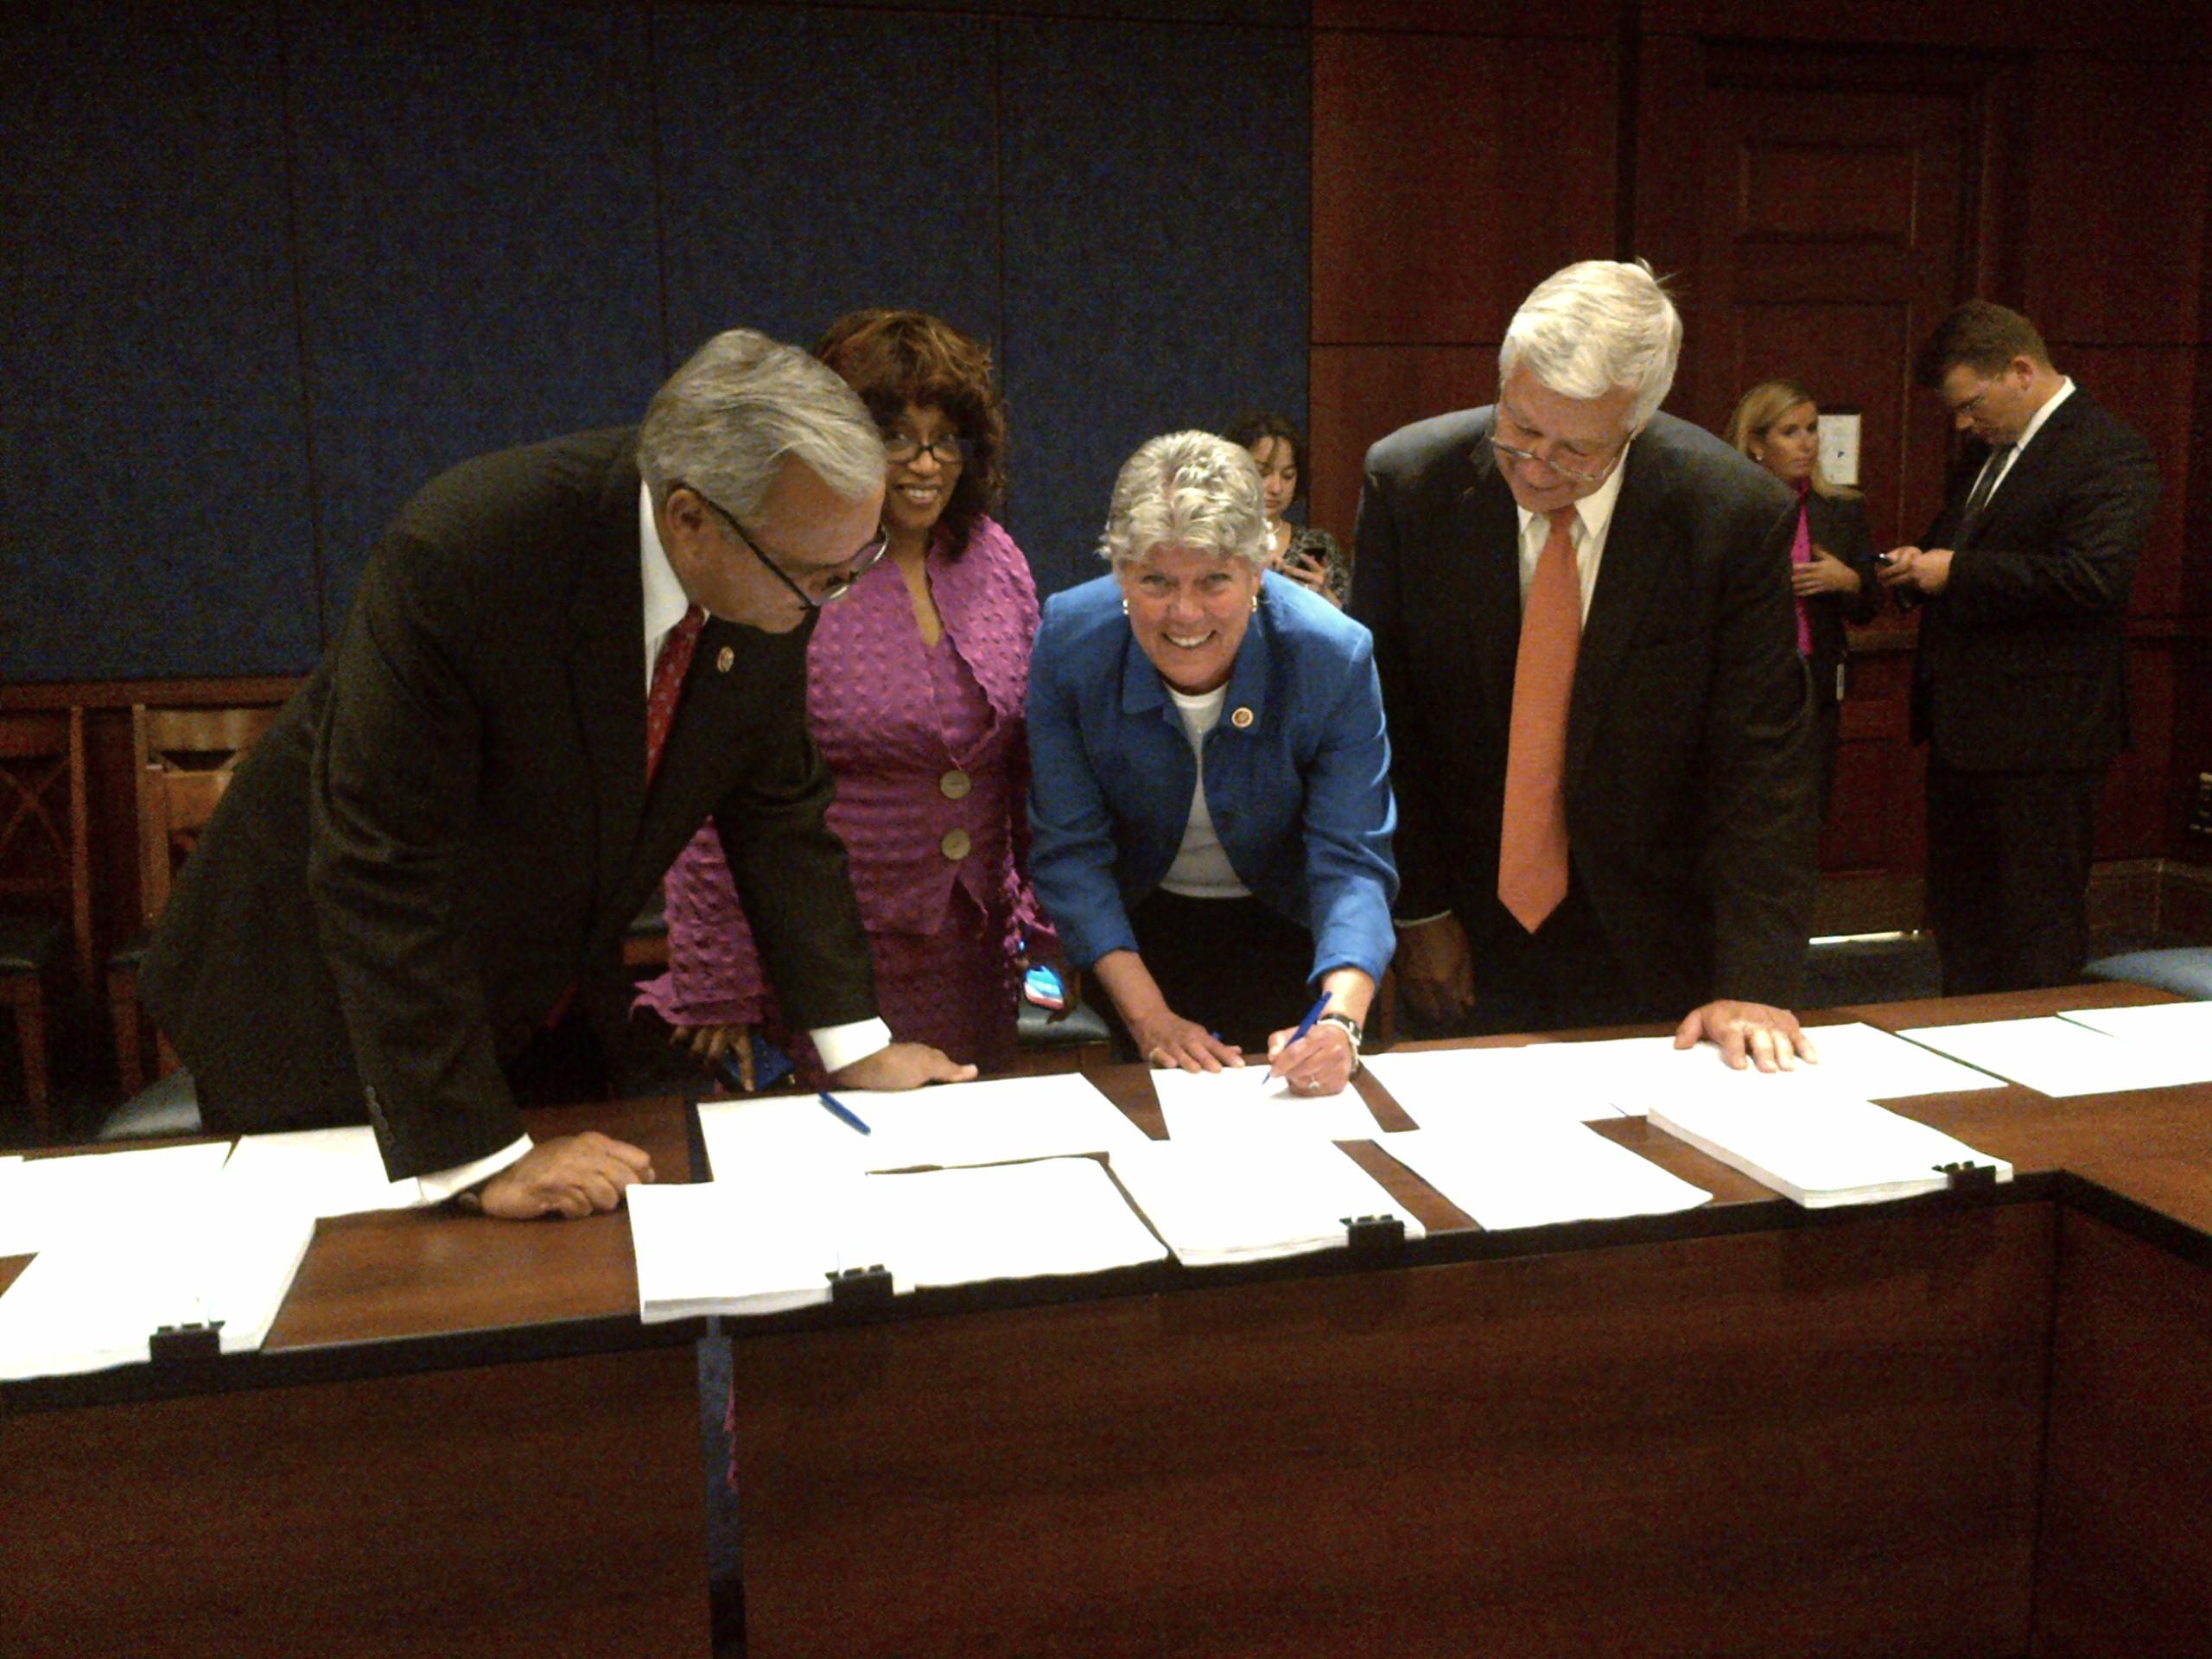 Brownley Signing Va Conference Agreement Congresswoman Julia Brownley